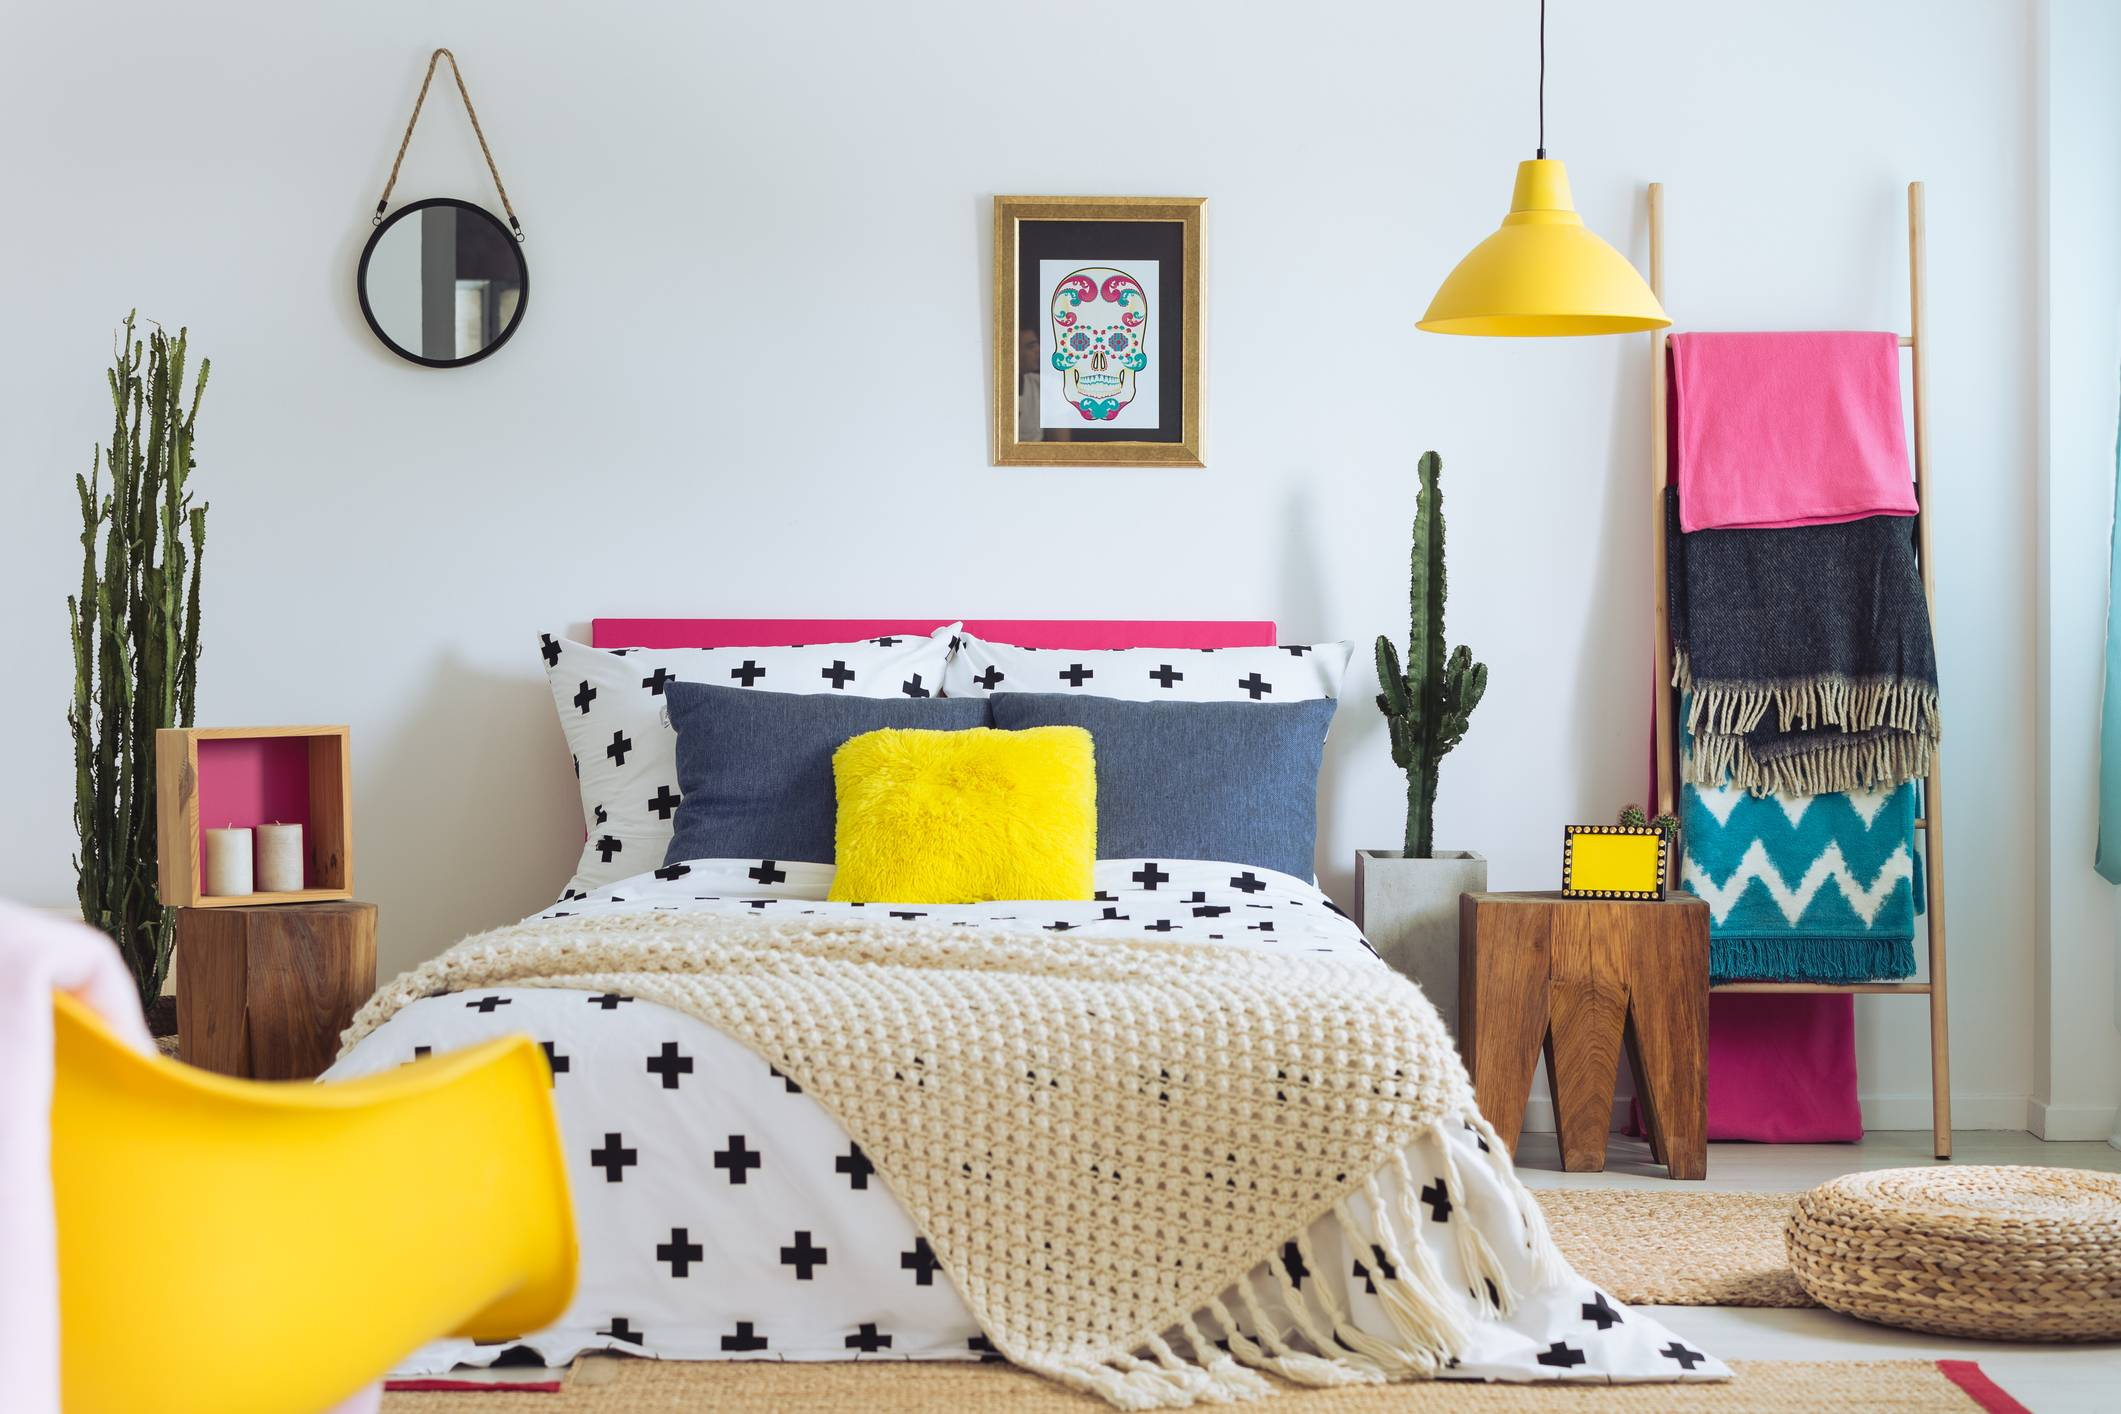 Feminine Bright Colorful Bedroom Polka Dot Bedding Statement Patterns